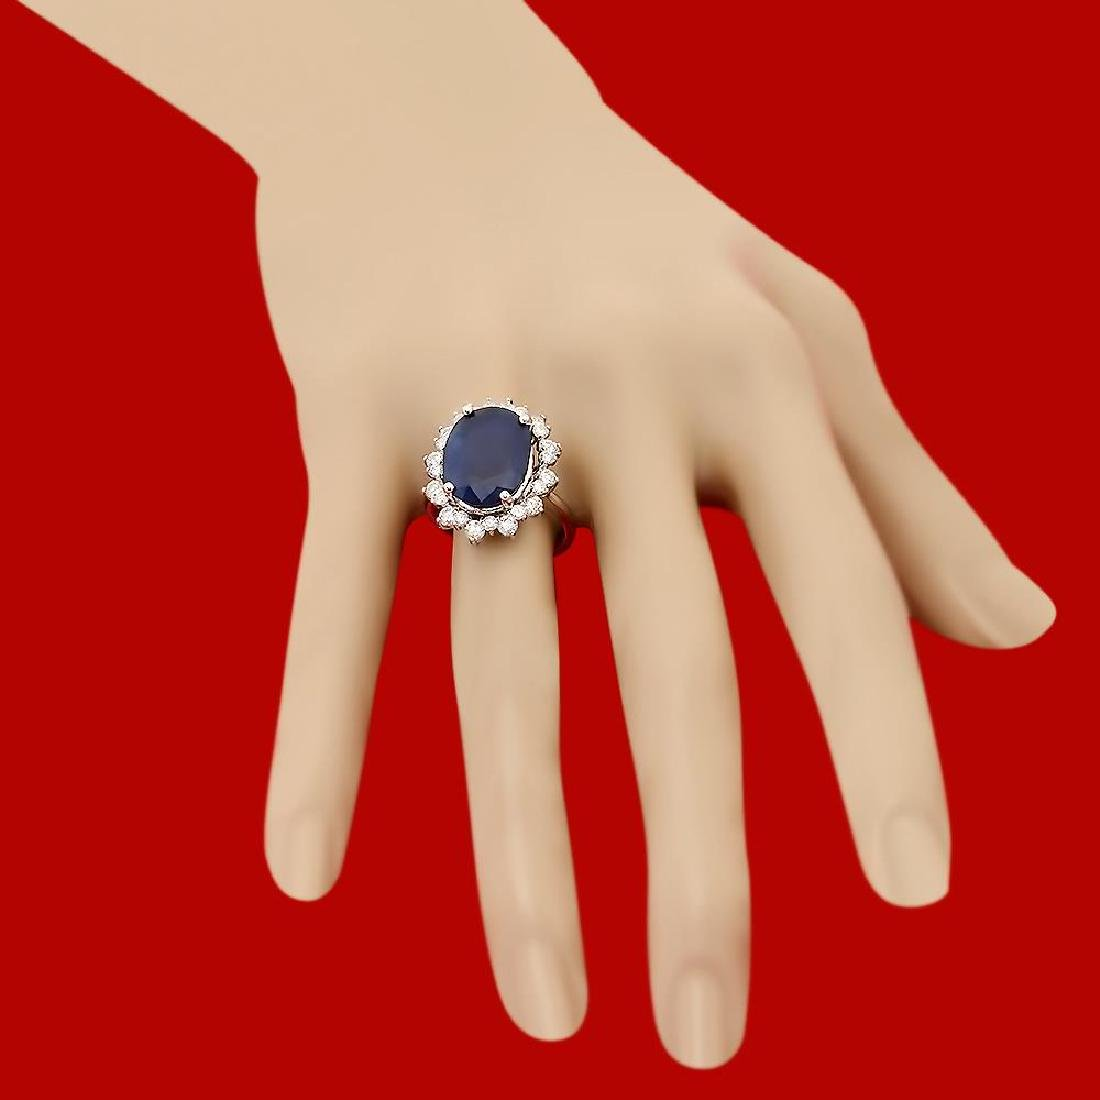 14k Gold 10.57ct Sapphire 1.77ct Diamond Ring - 3